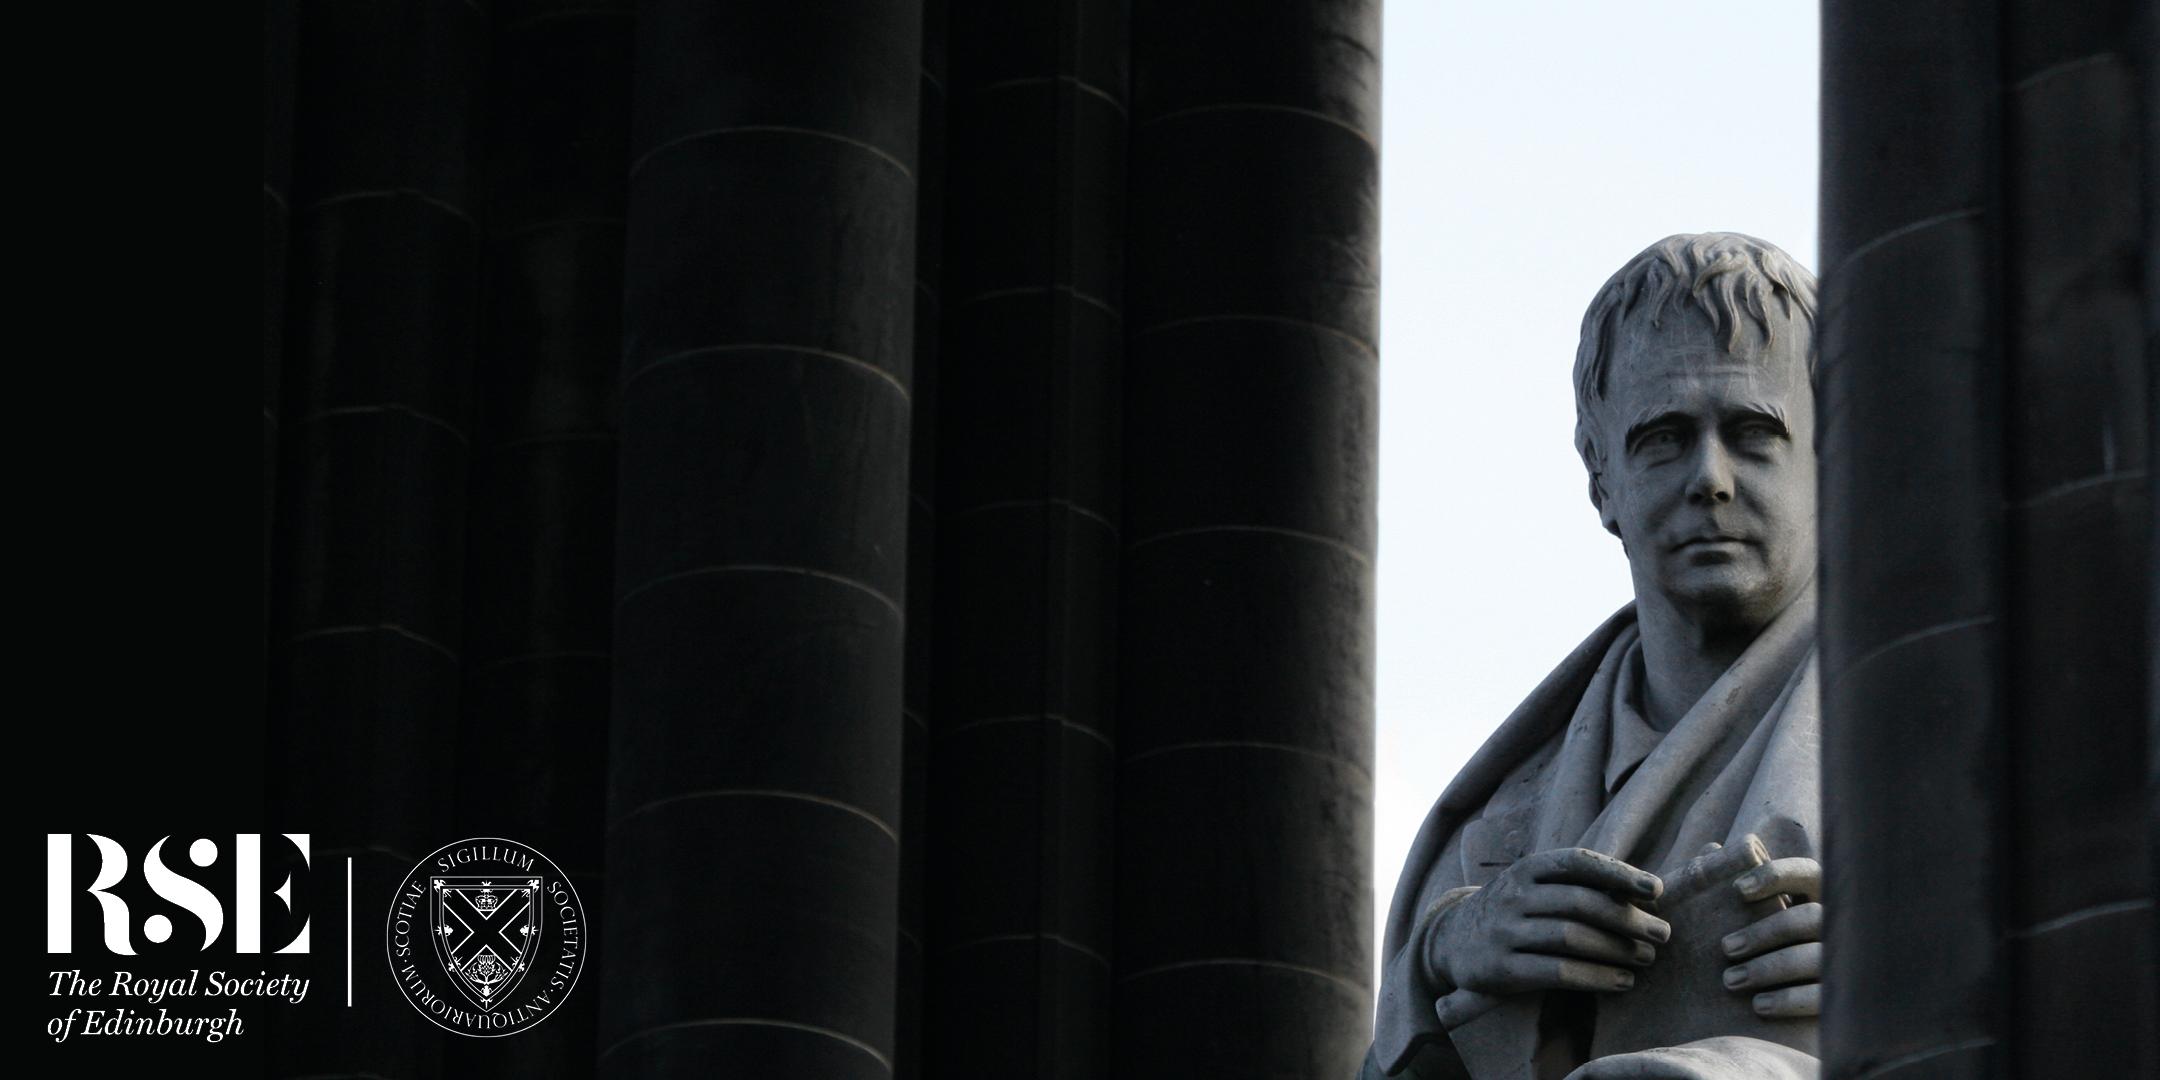 The Scott Monument, Princes Street Gardens, Edinburgh